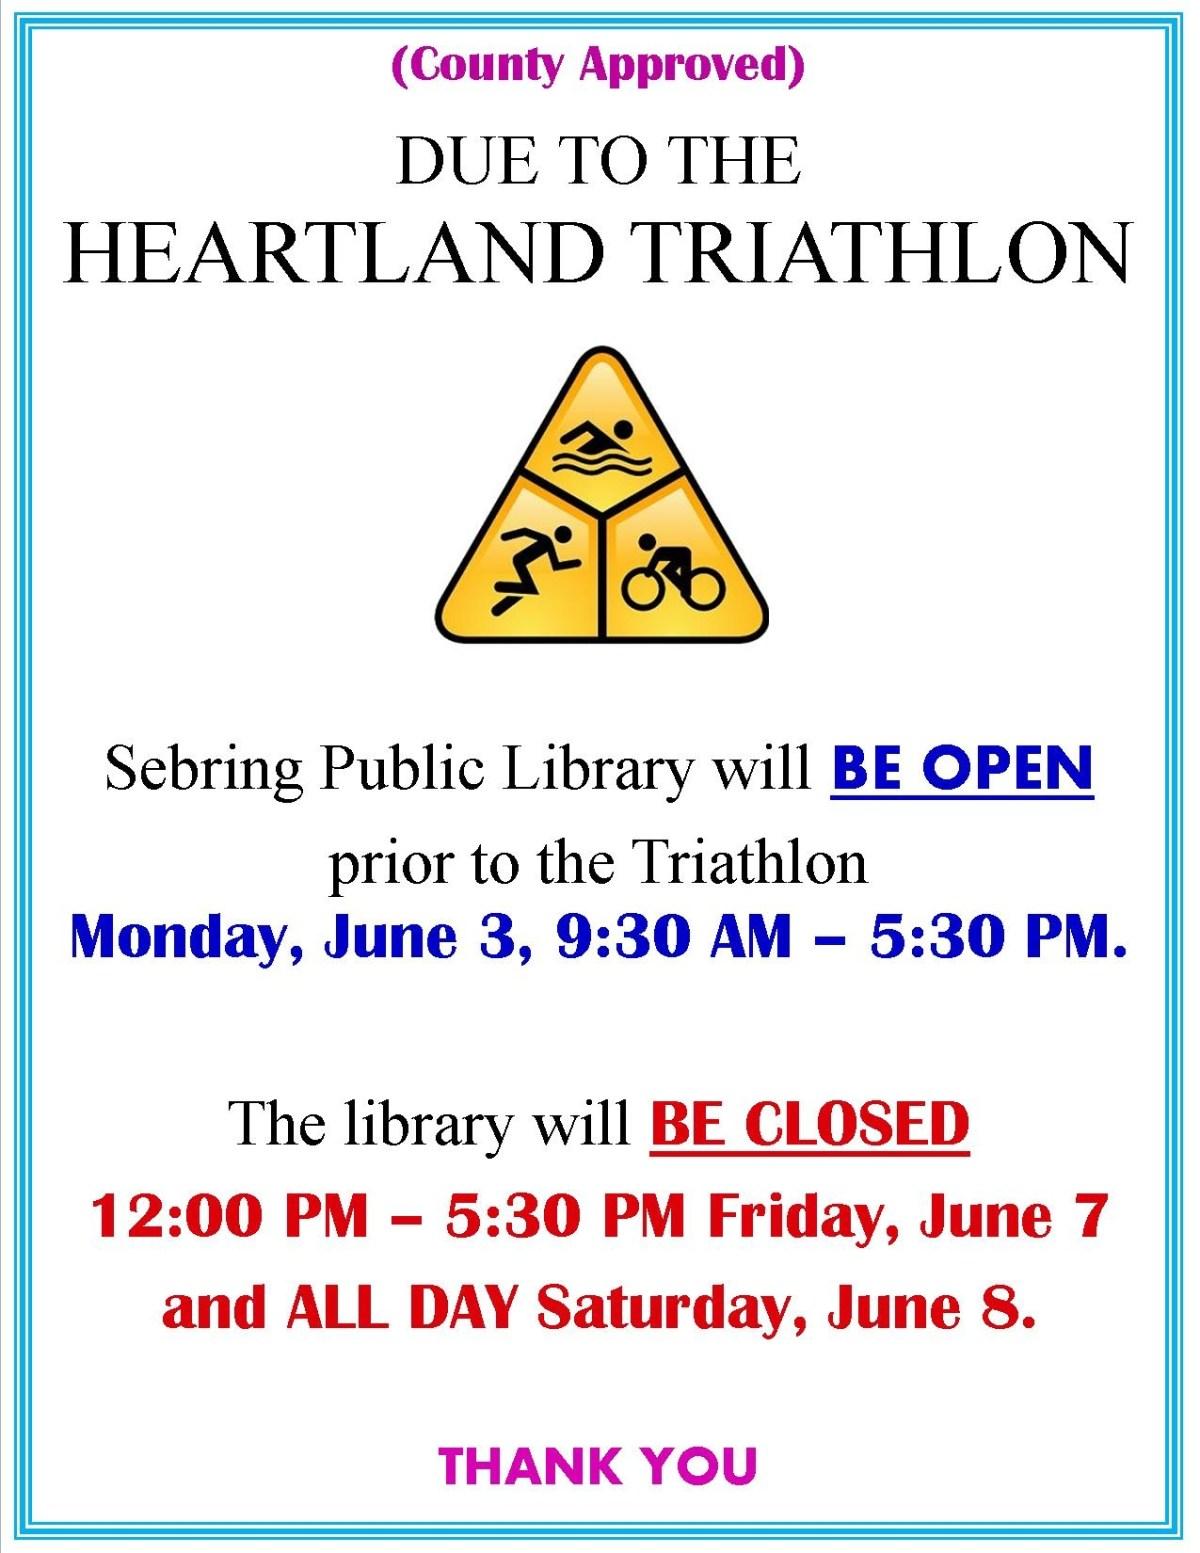 Heartland Triathlon Website posting